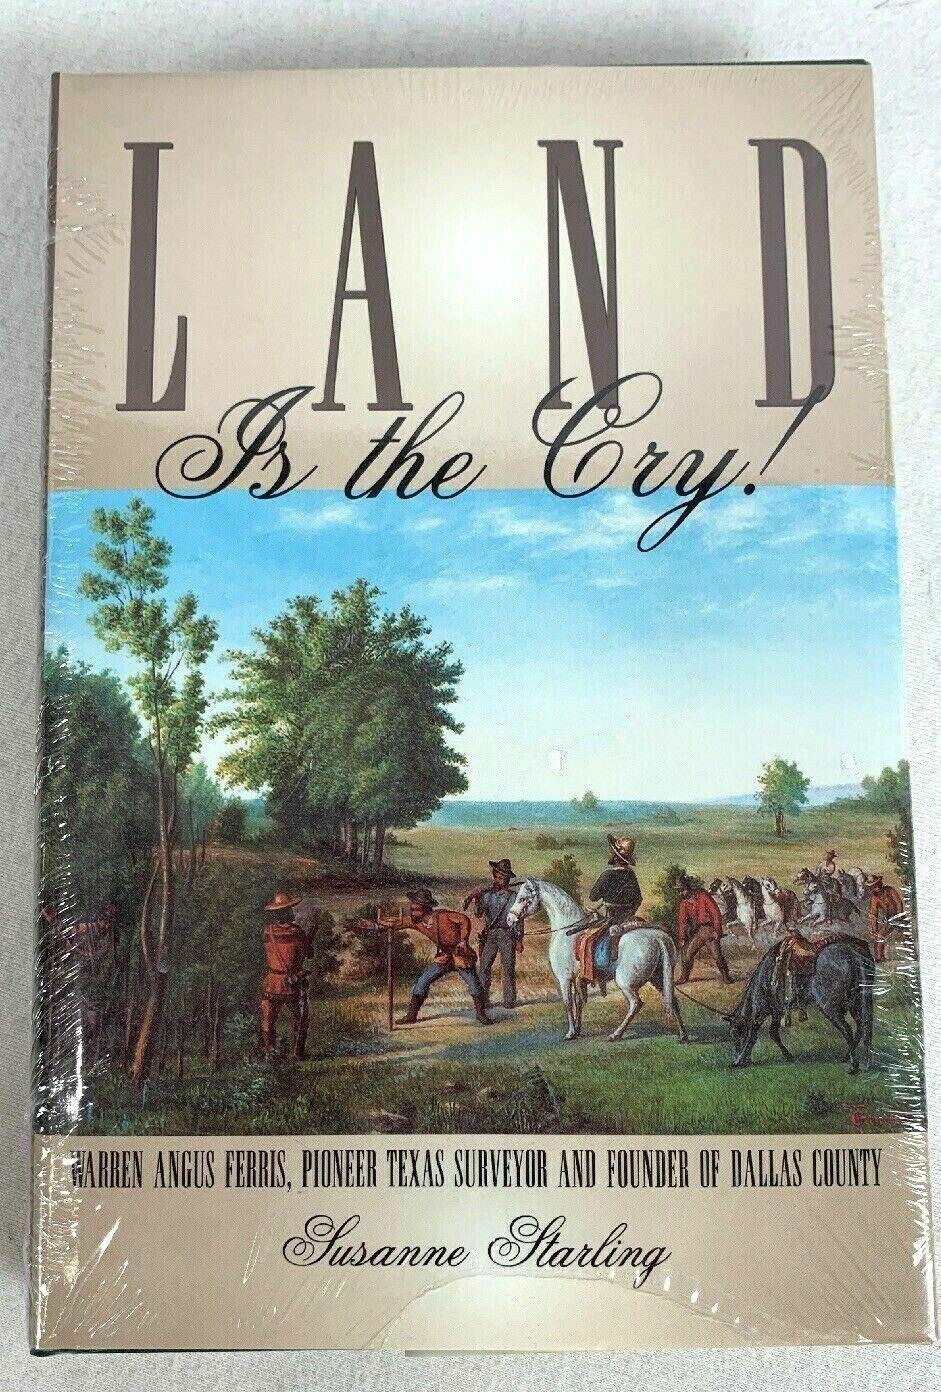 Land Is the Cry! Warren Angus Ferris Pioneer Texas Surveyor Founder of Dallas B3